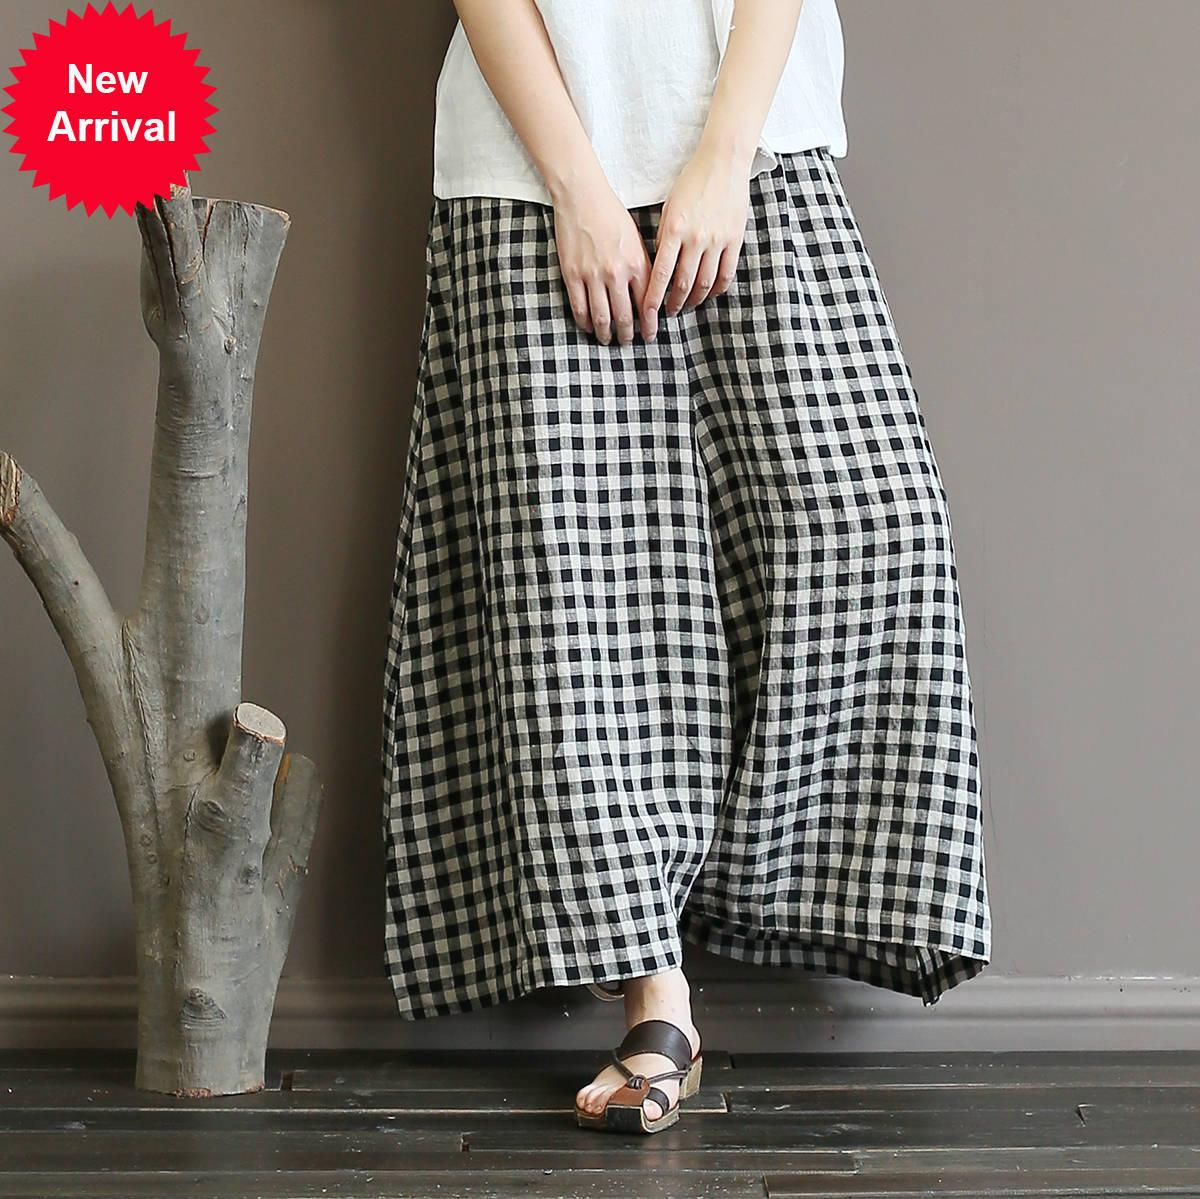 Johnature Vintage Plaid Plaid Mid Cintura Pantalones 2020 Nuevos bolsillos sueltos sueltos Mujeres de longitud completa Longitud ancha Pantsw32